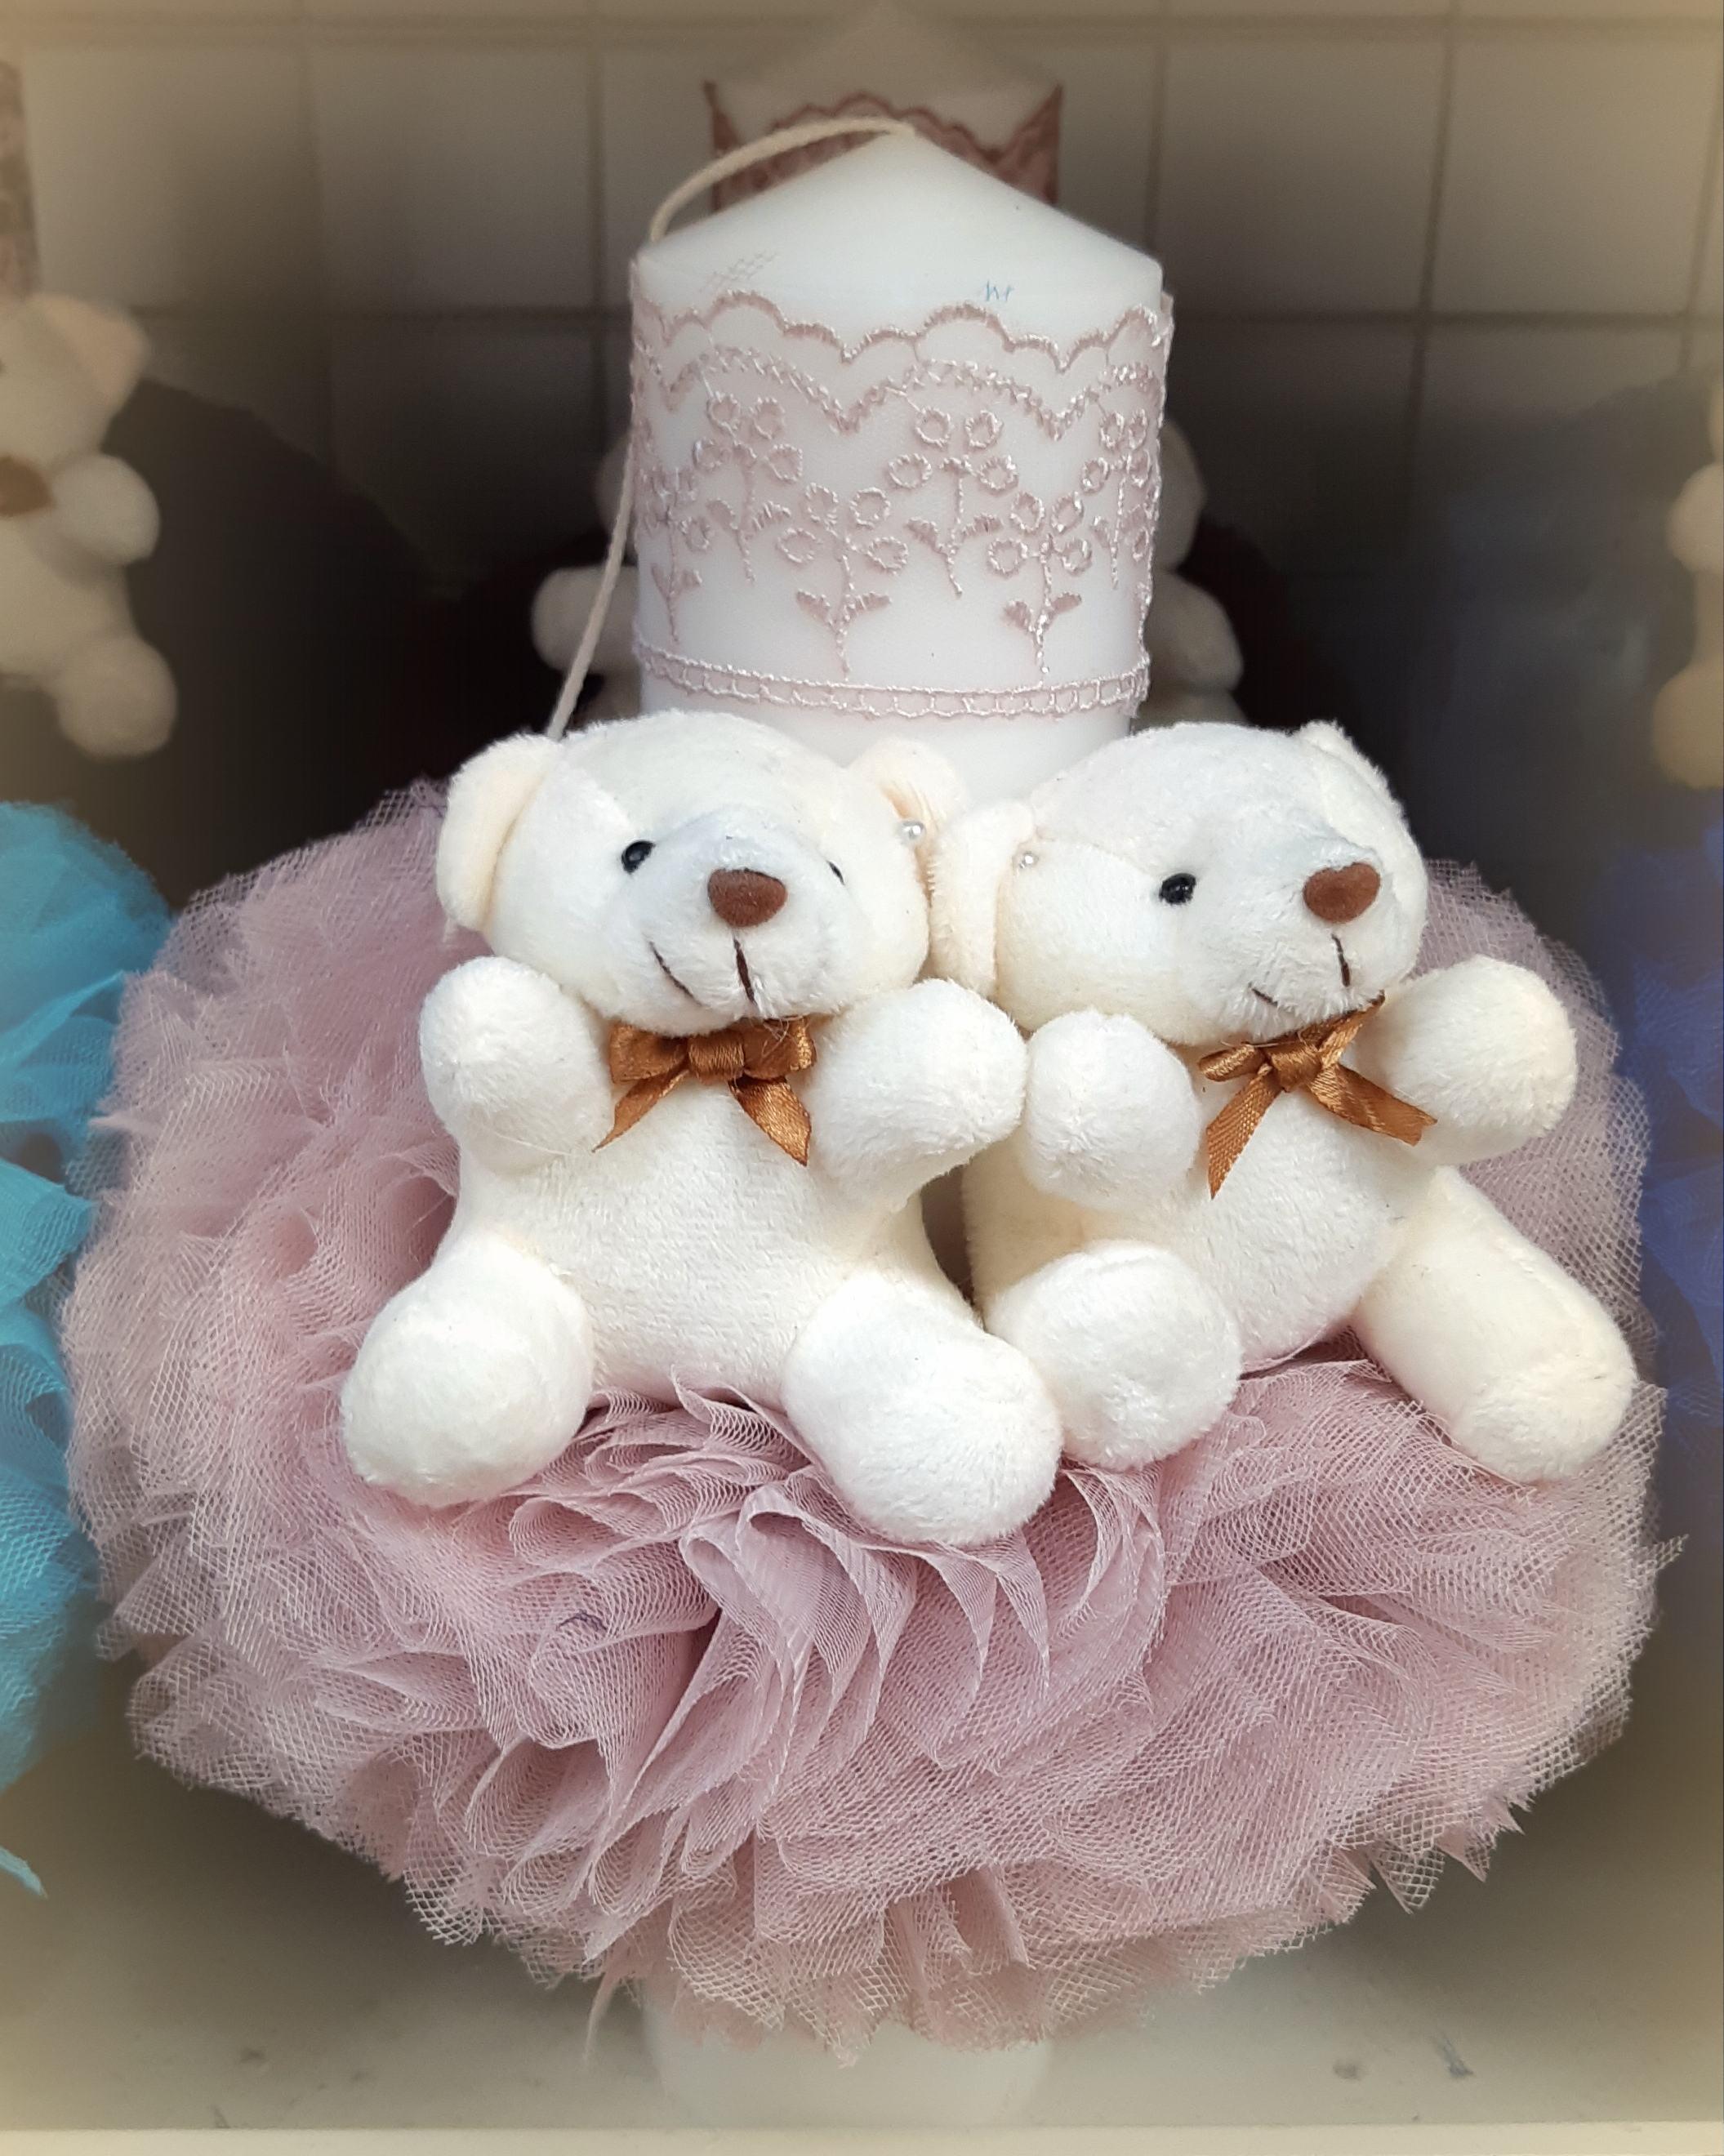 Lumanare pentru botezul fetitelor, roz prafuit - ROZP2451